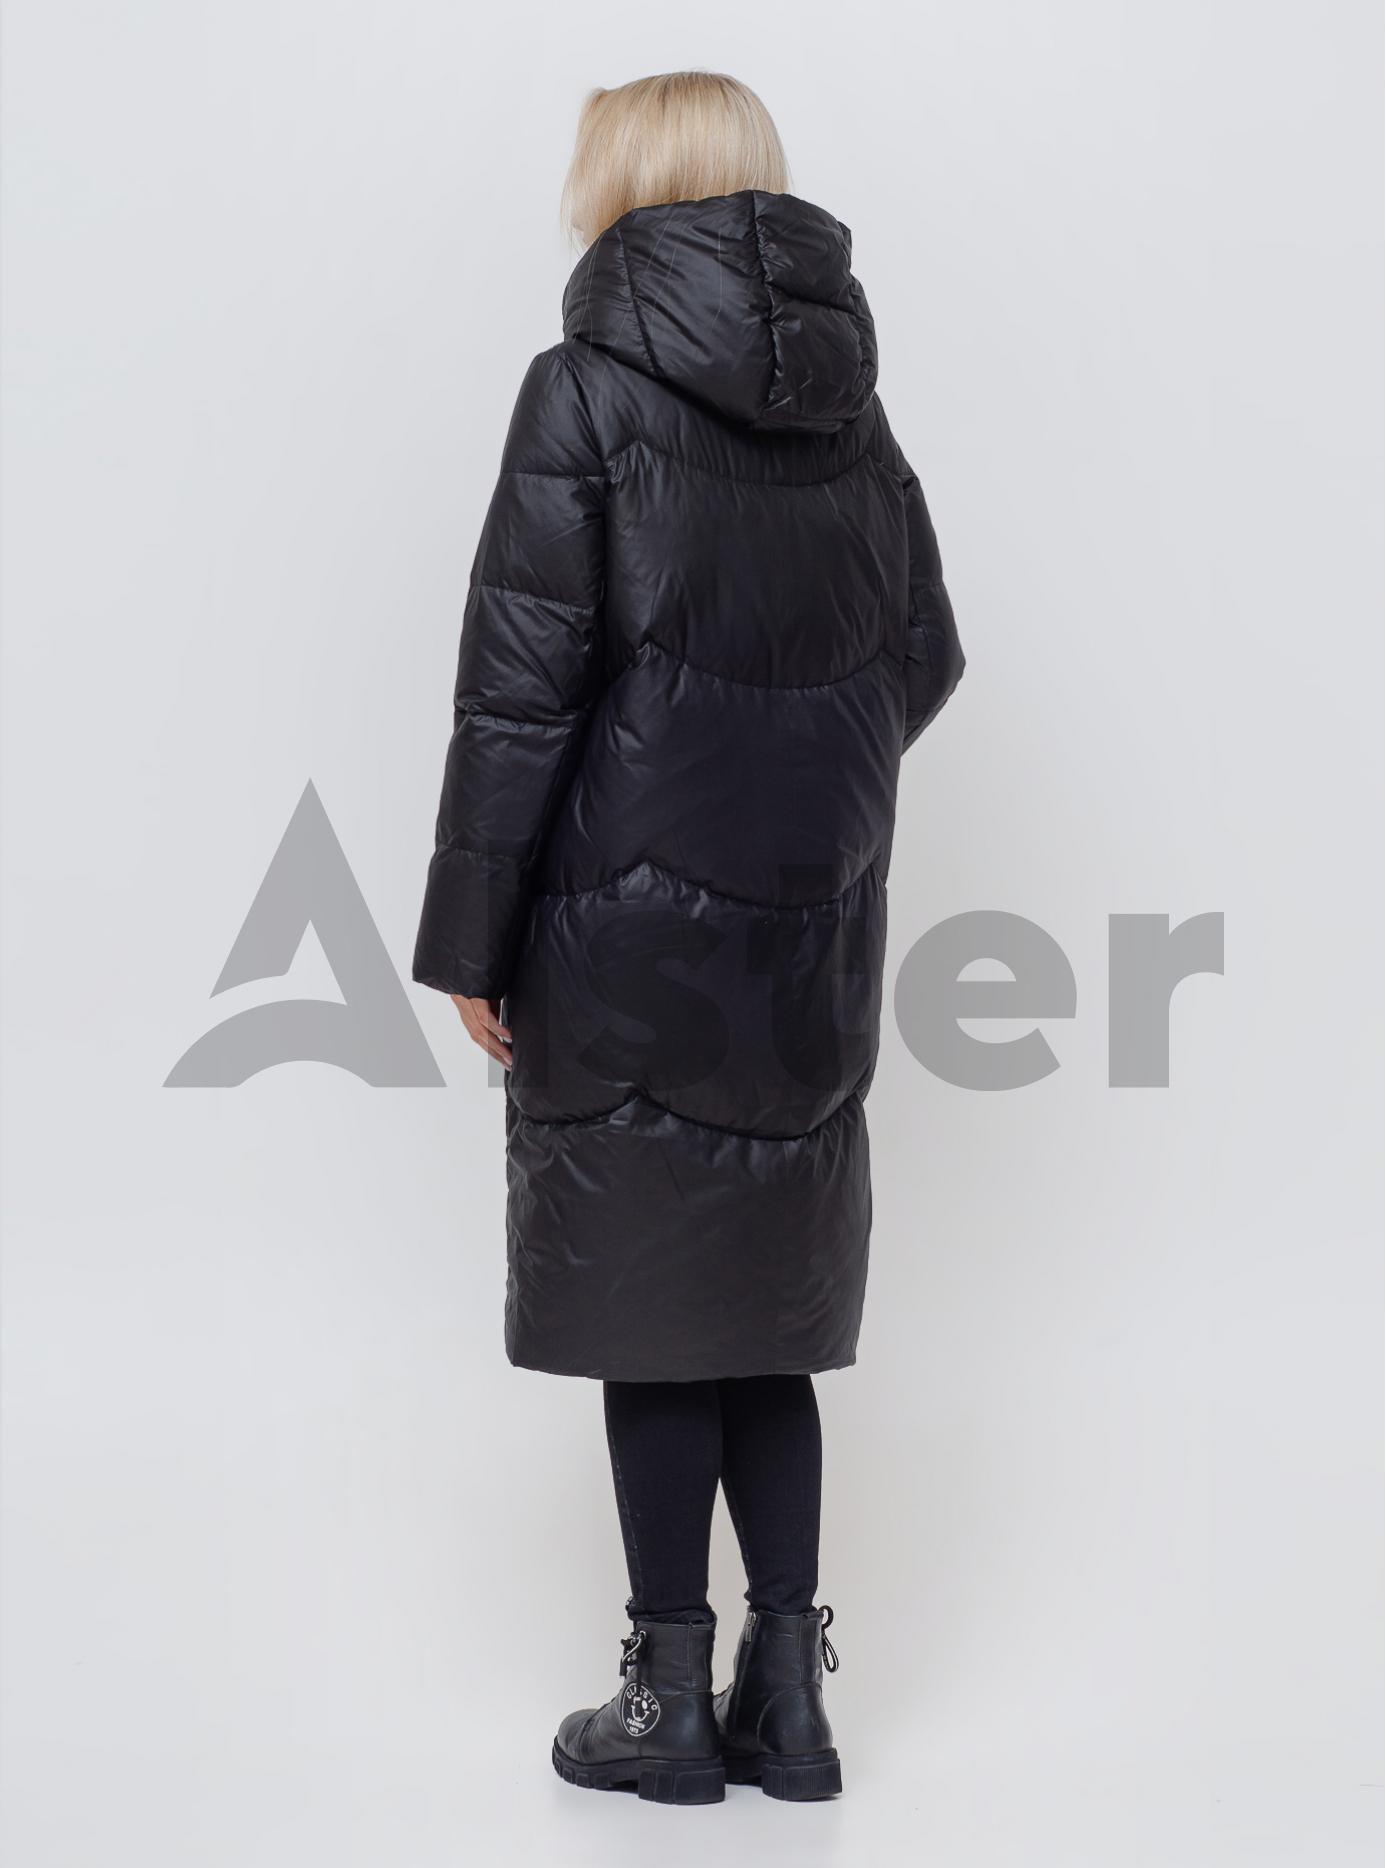 Пуховик жіночий натуральний Чорний S (05-SV201015): фото - Alster.ua